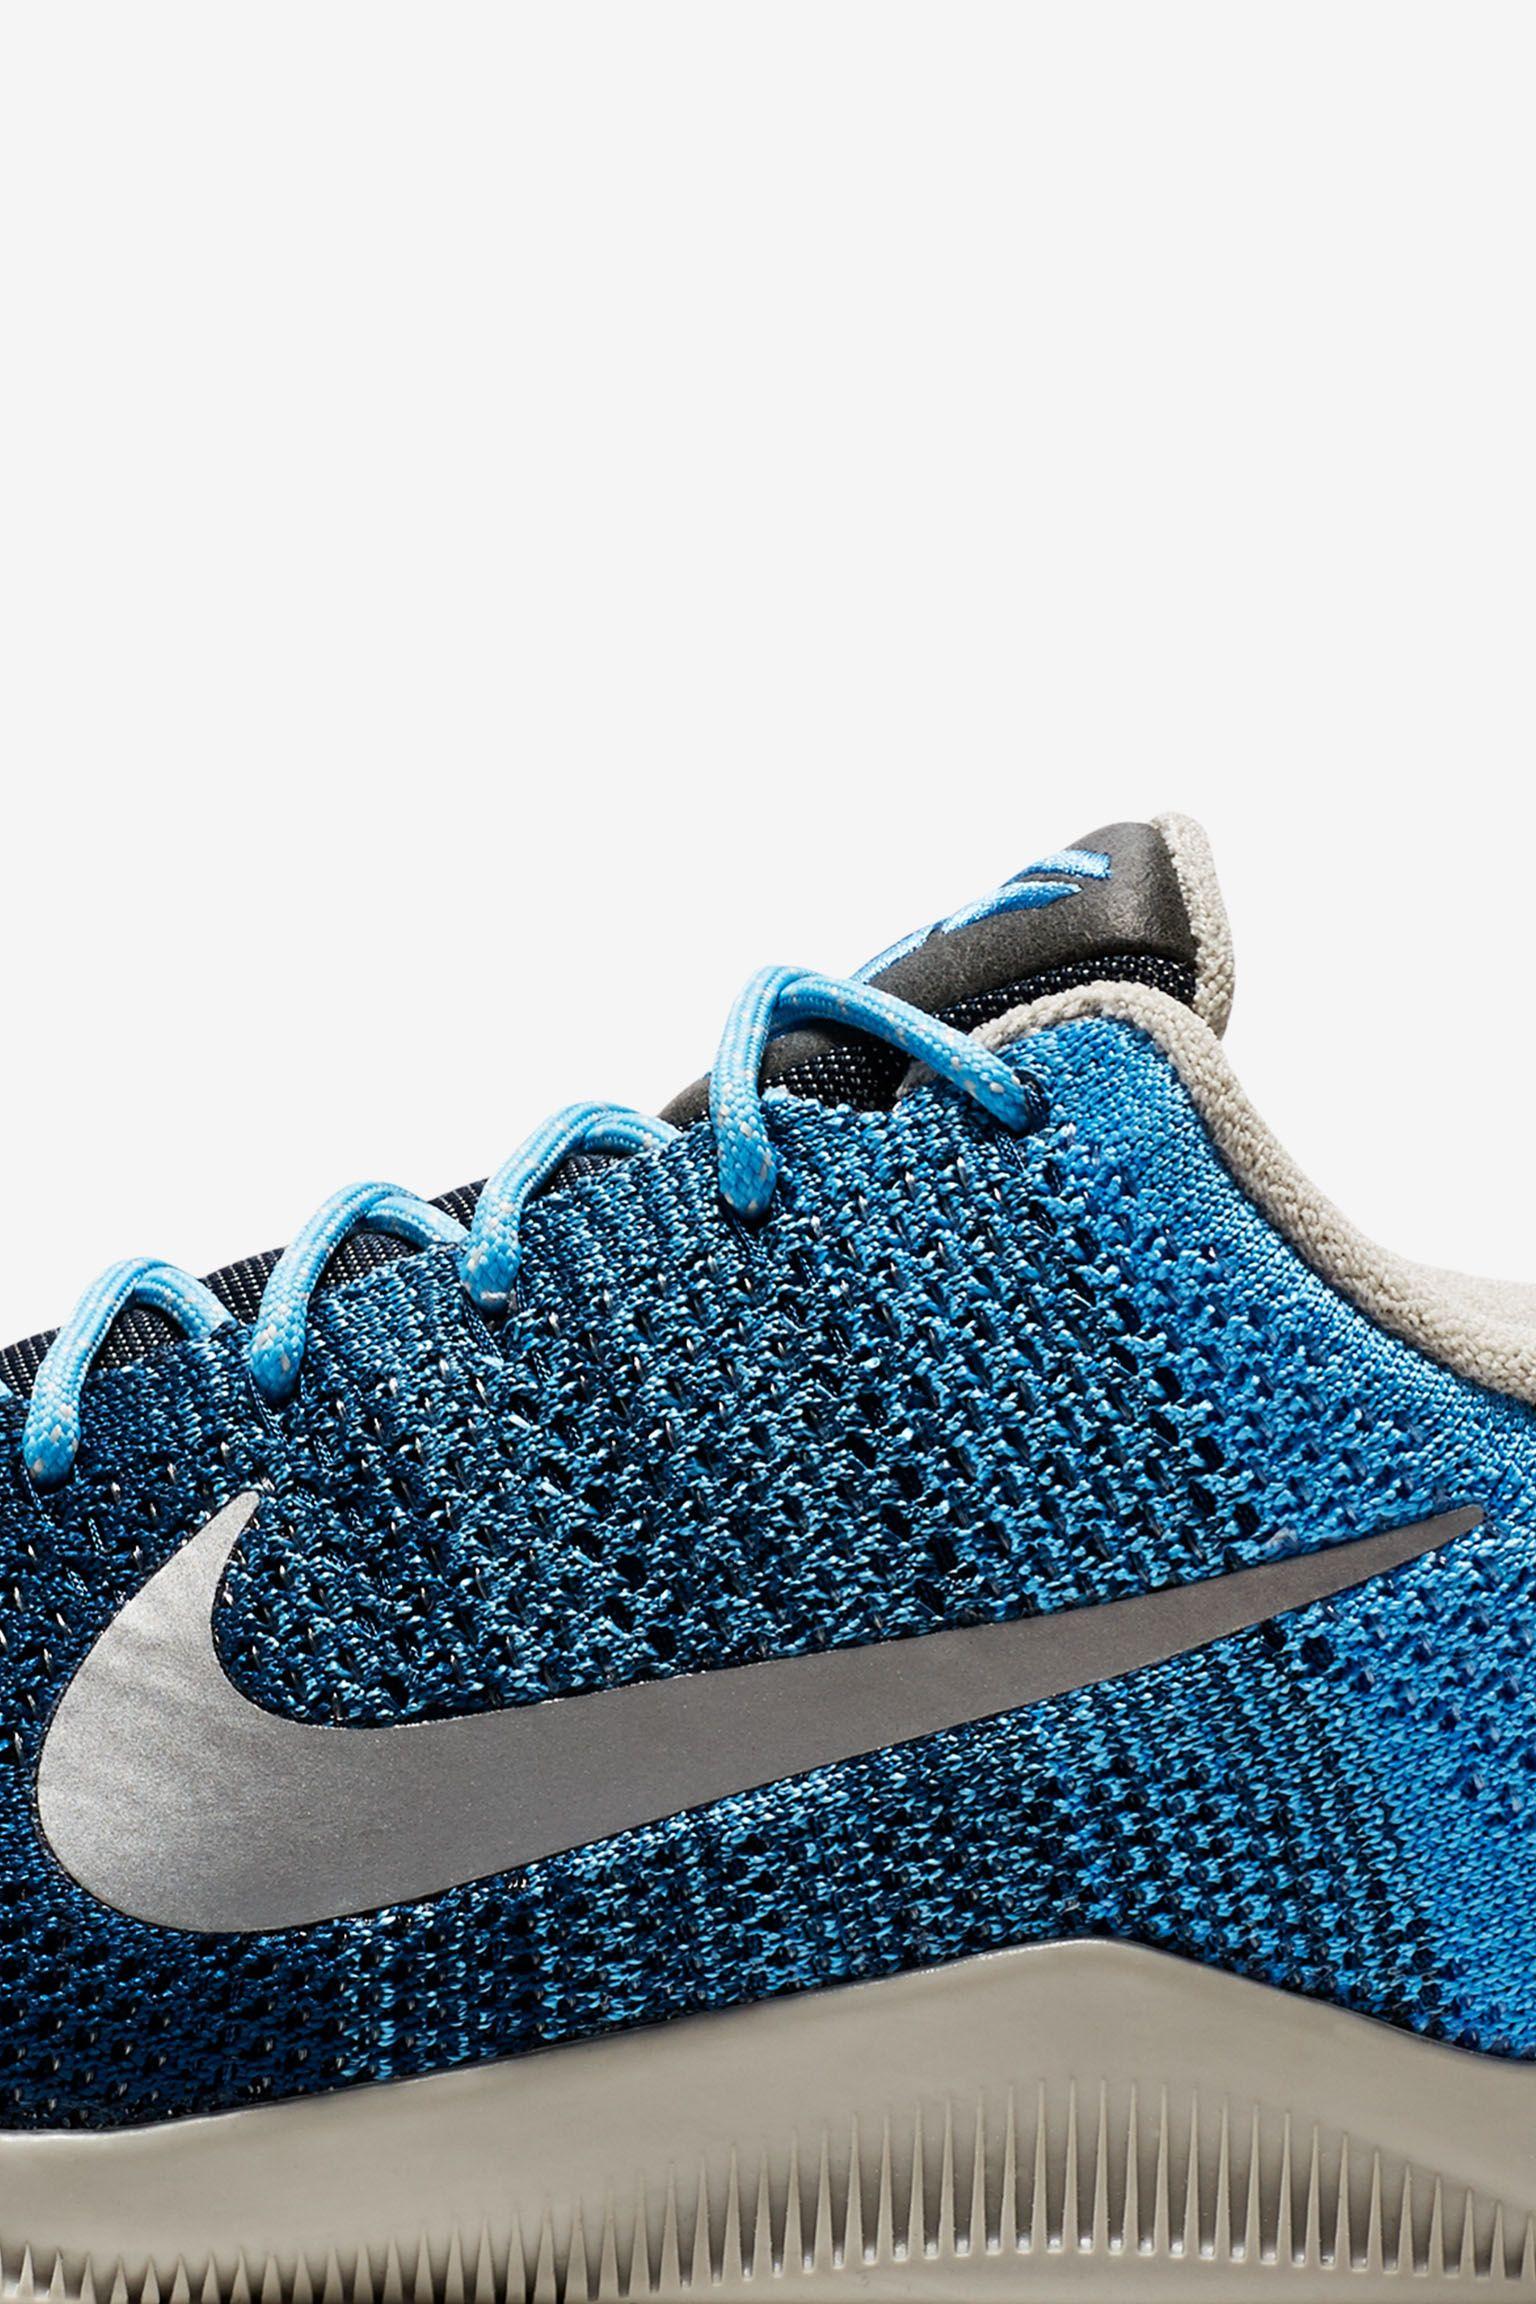 Nike Kobe 11 Elite 'Avar Muse' Release Date